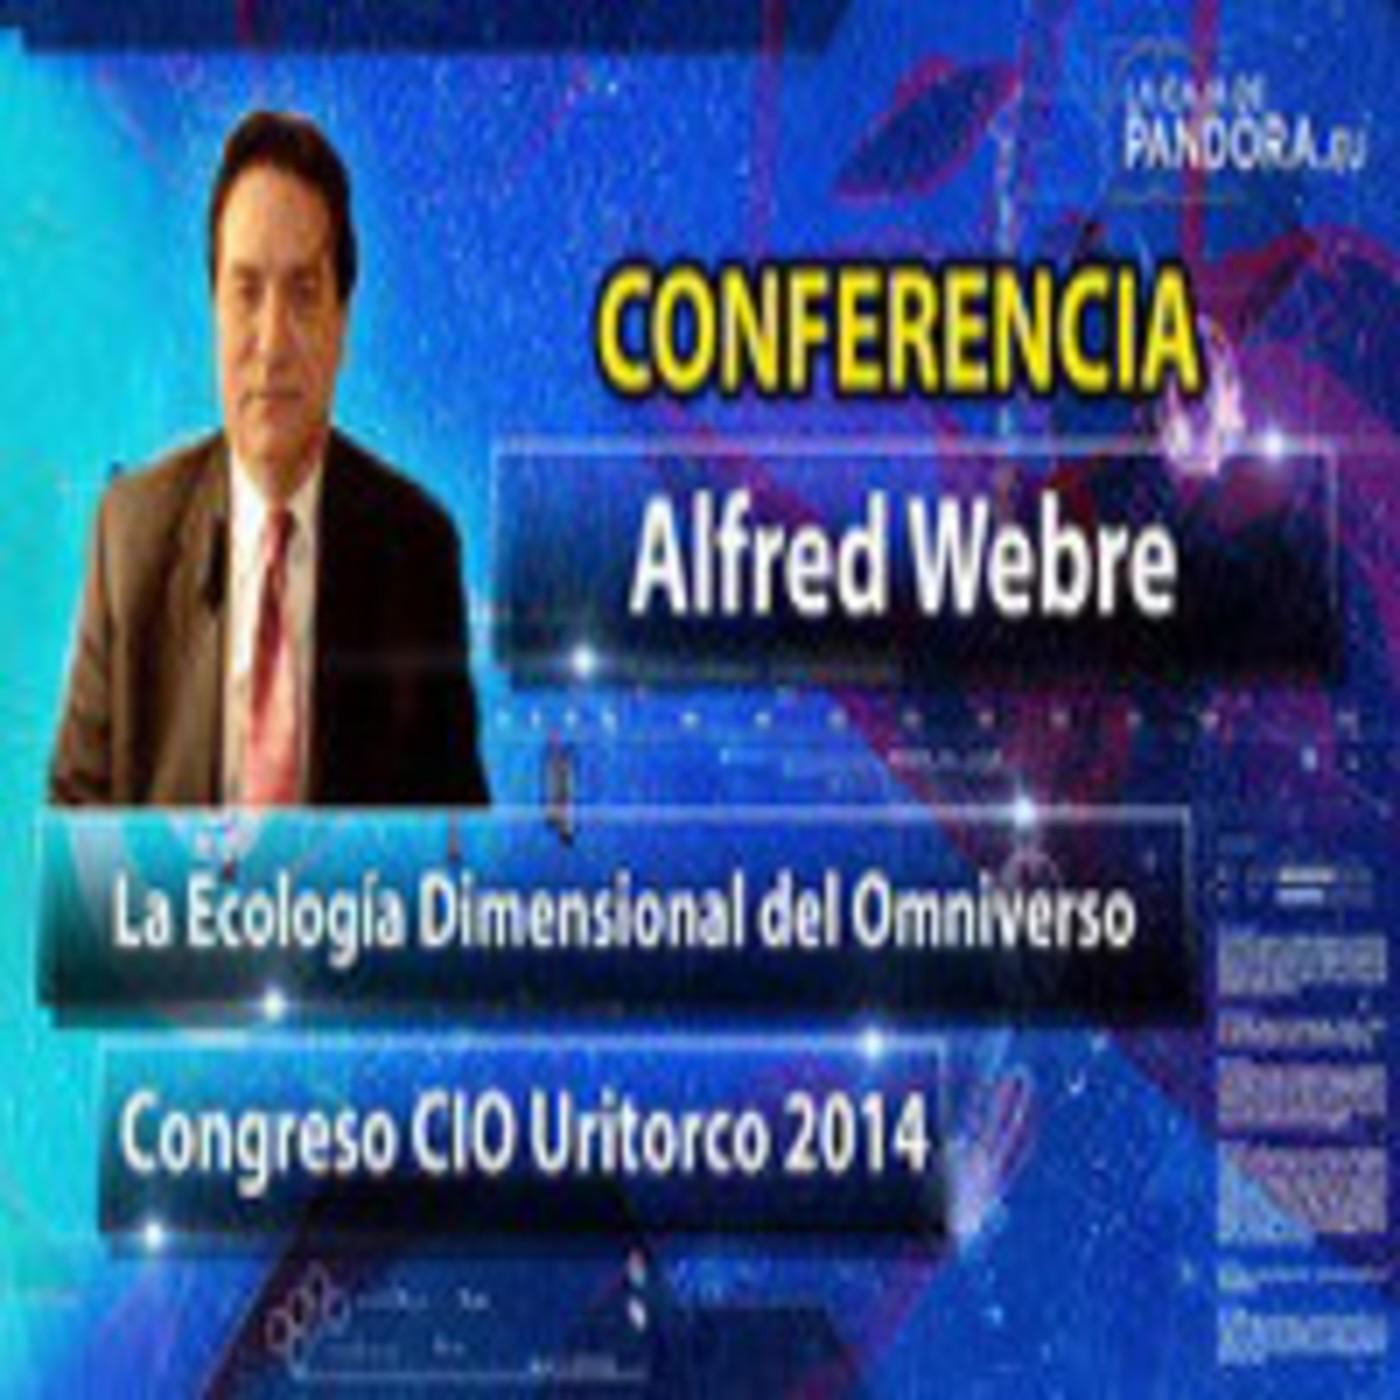 Alfred Webre - Congreso Internacional de OVNILOGIA - CIO URITORCO 2014